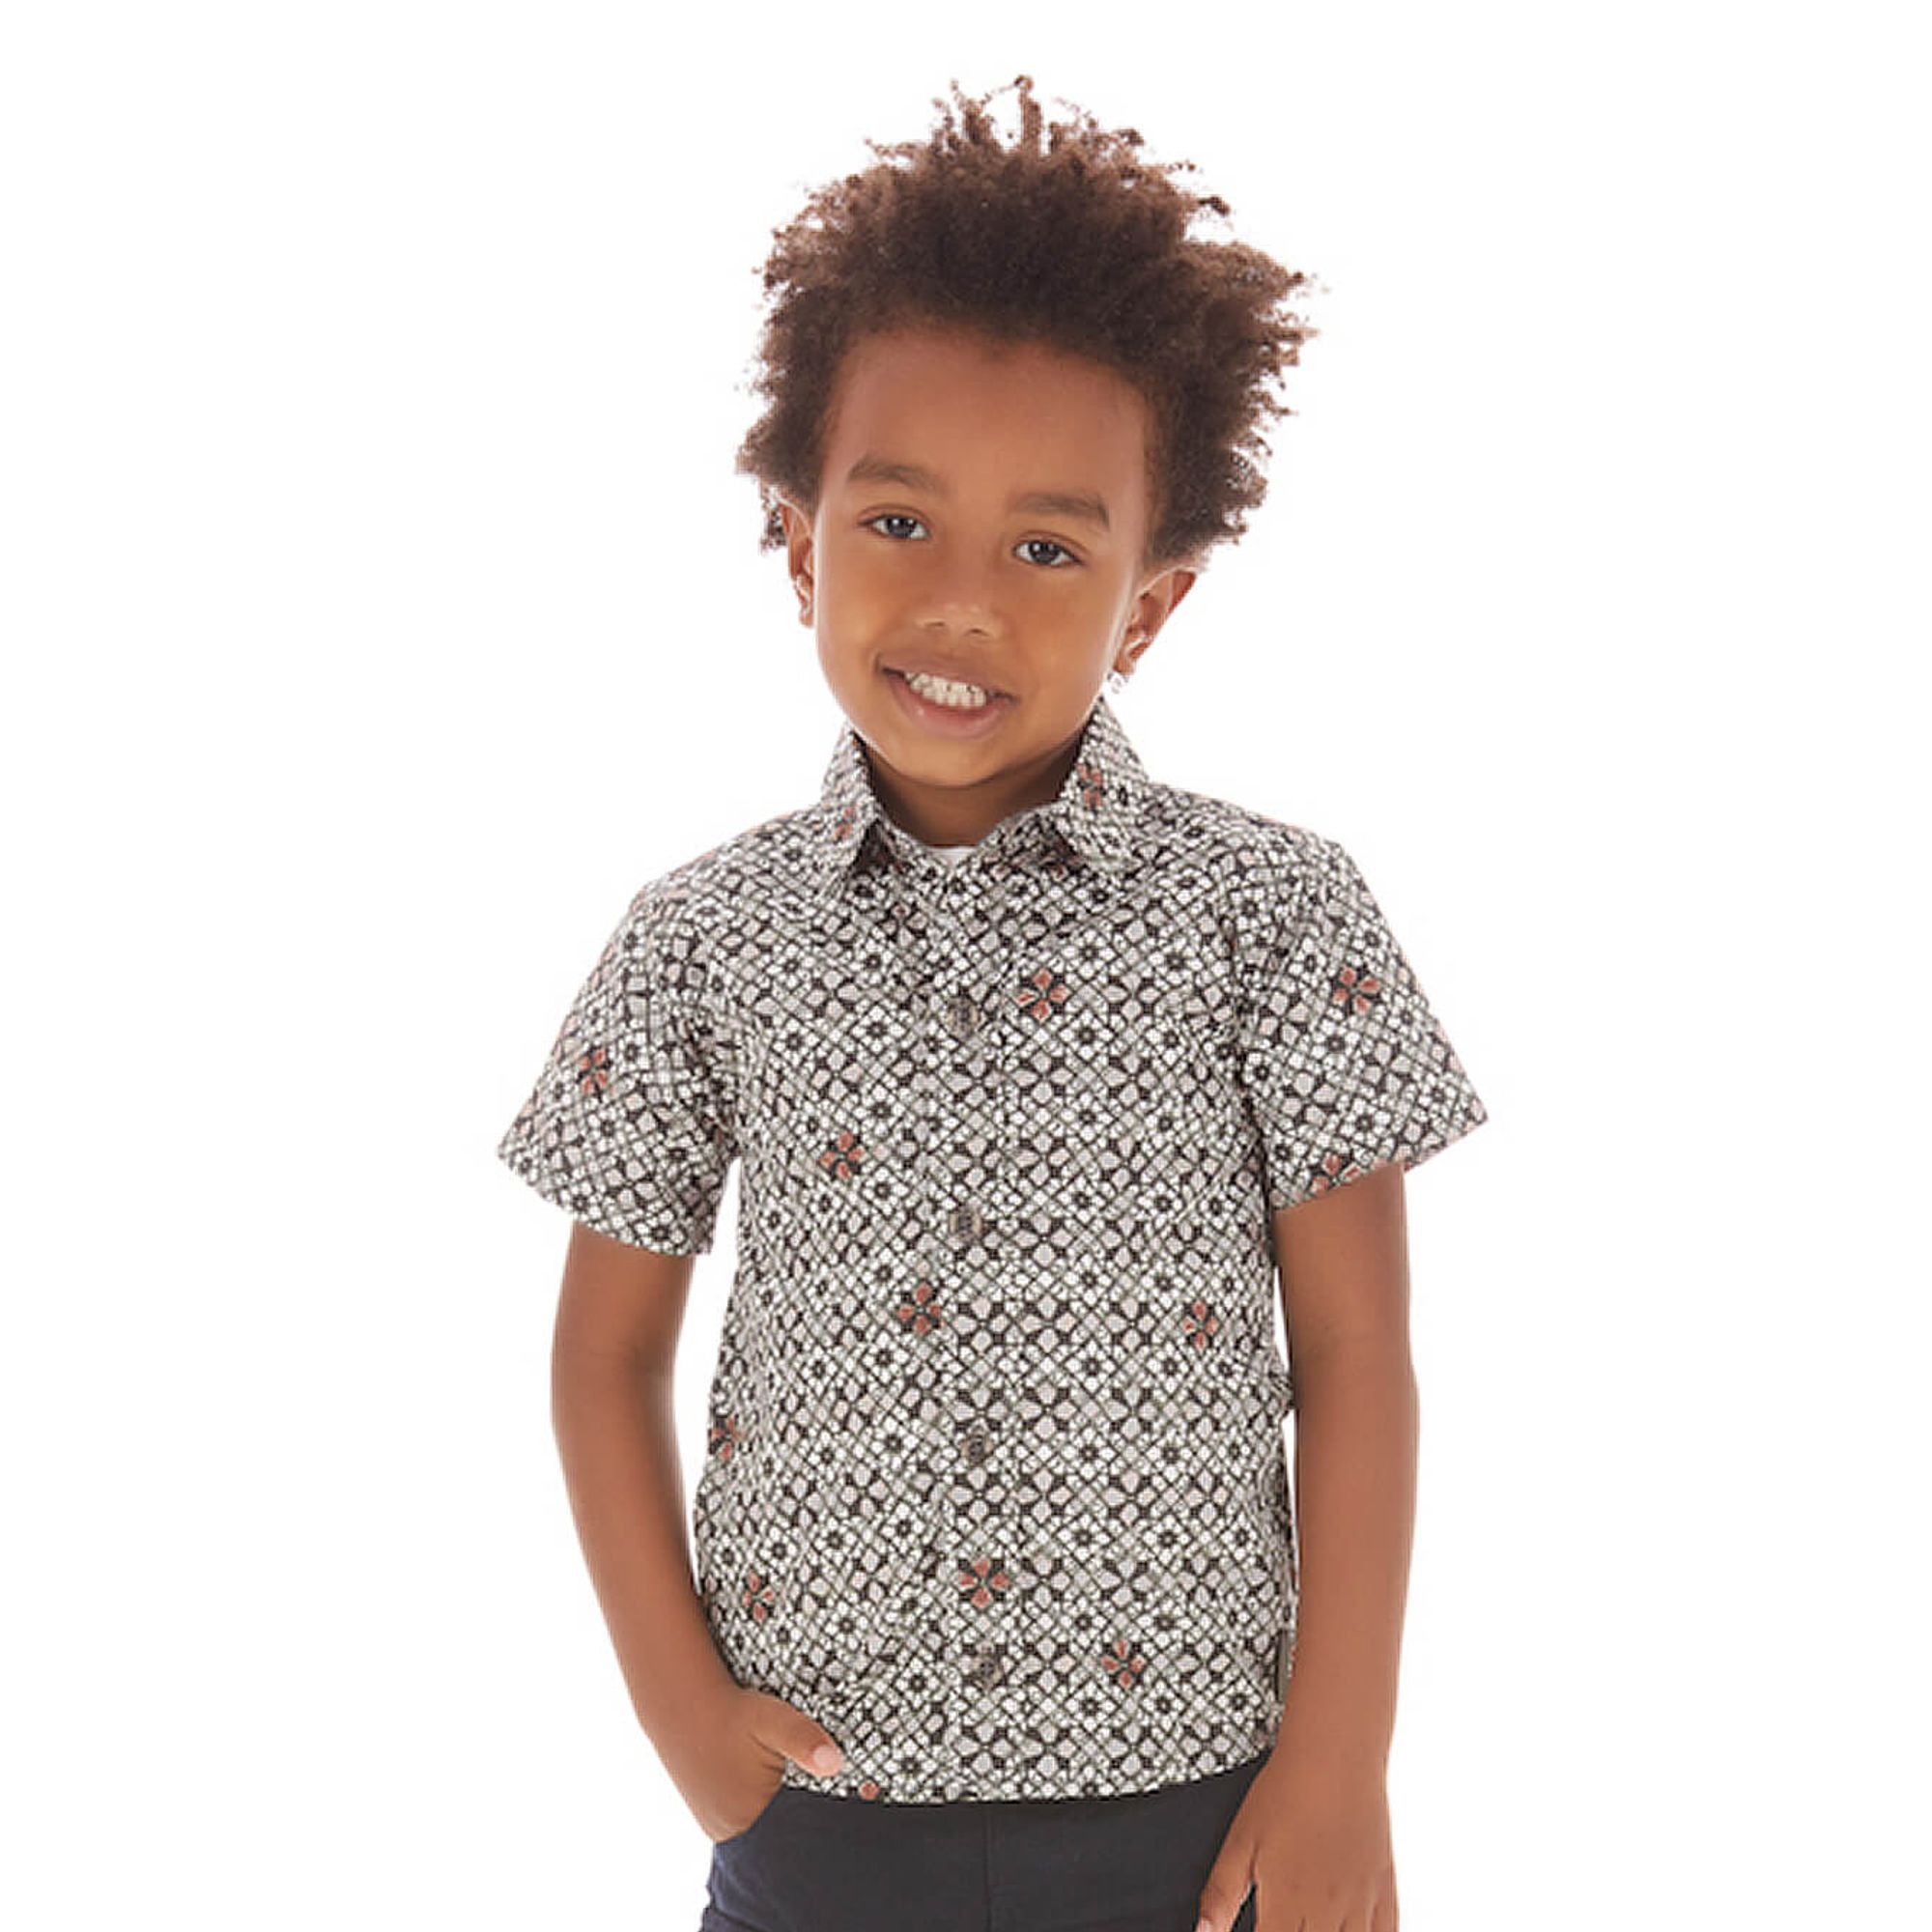 camisa-menino-com-estampa-digital-grafica-branco-preto-up-baby